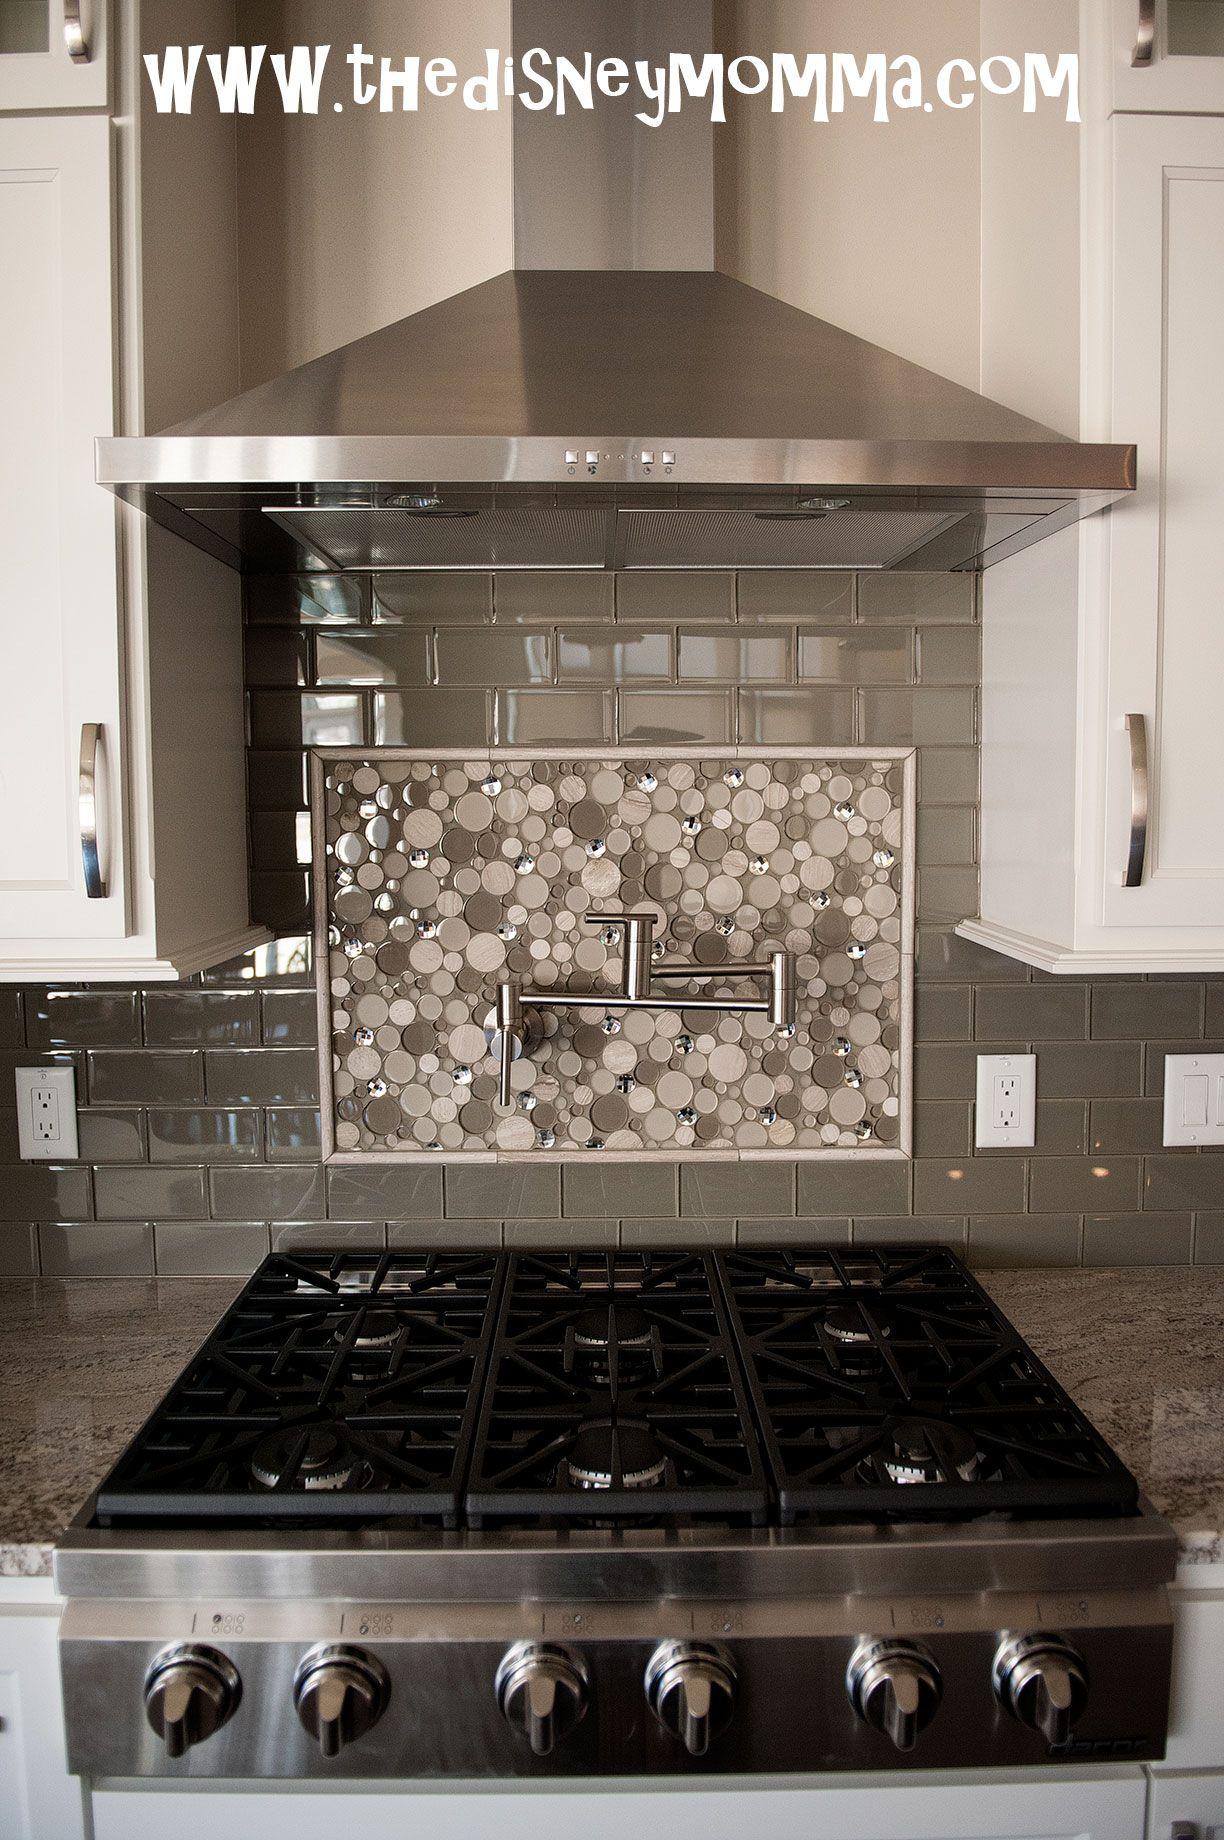 Dacor 36 Gas Cooktop Gl Subway Tile Accent Back Splash Danze Pot Filler